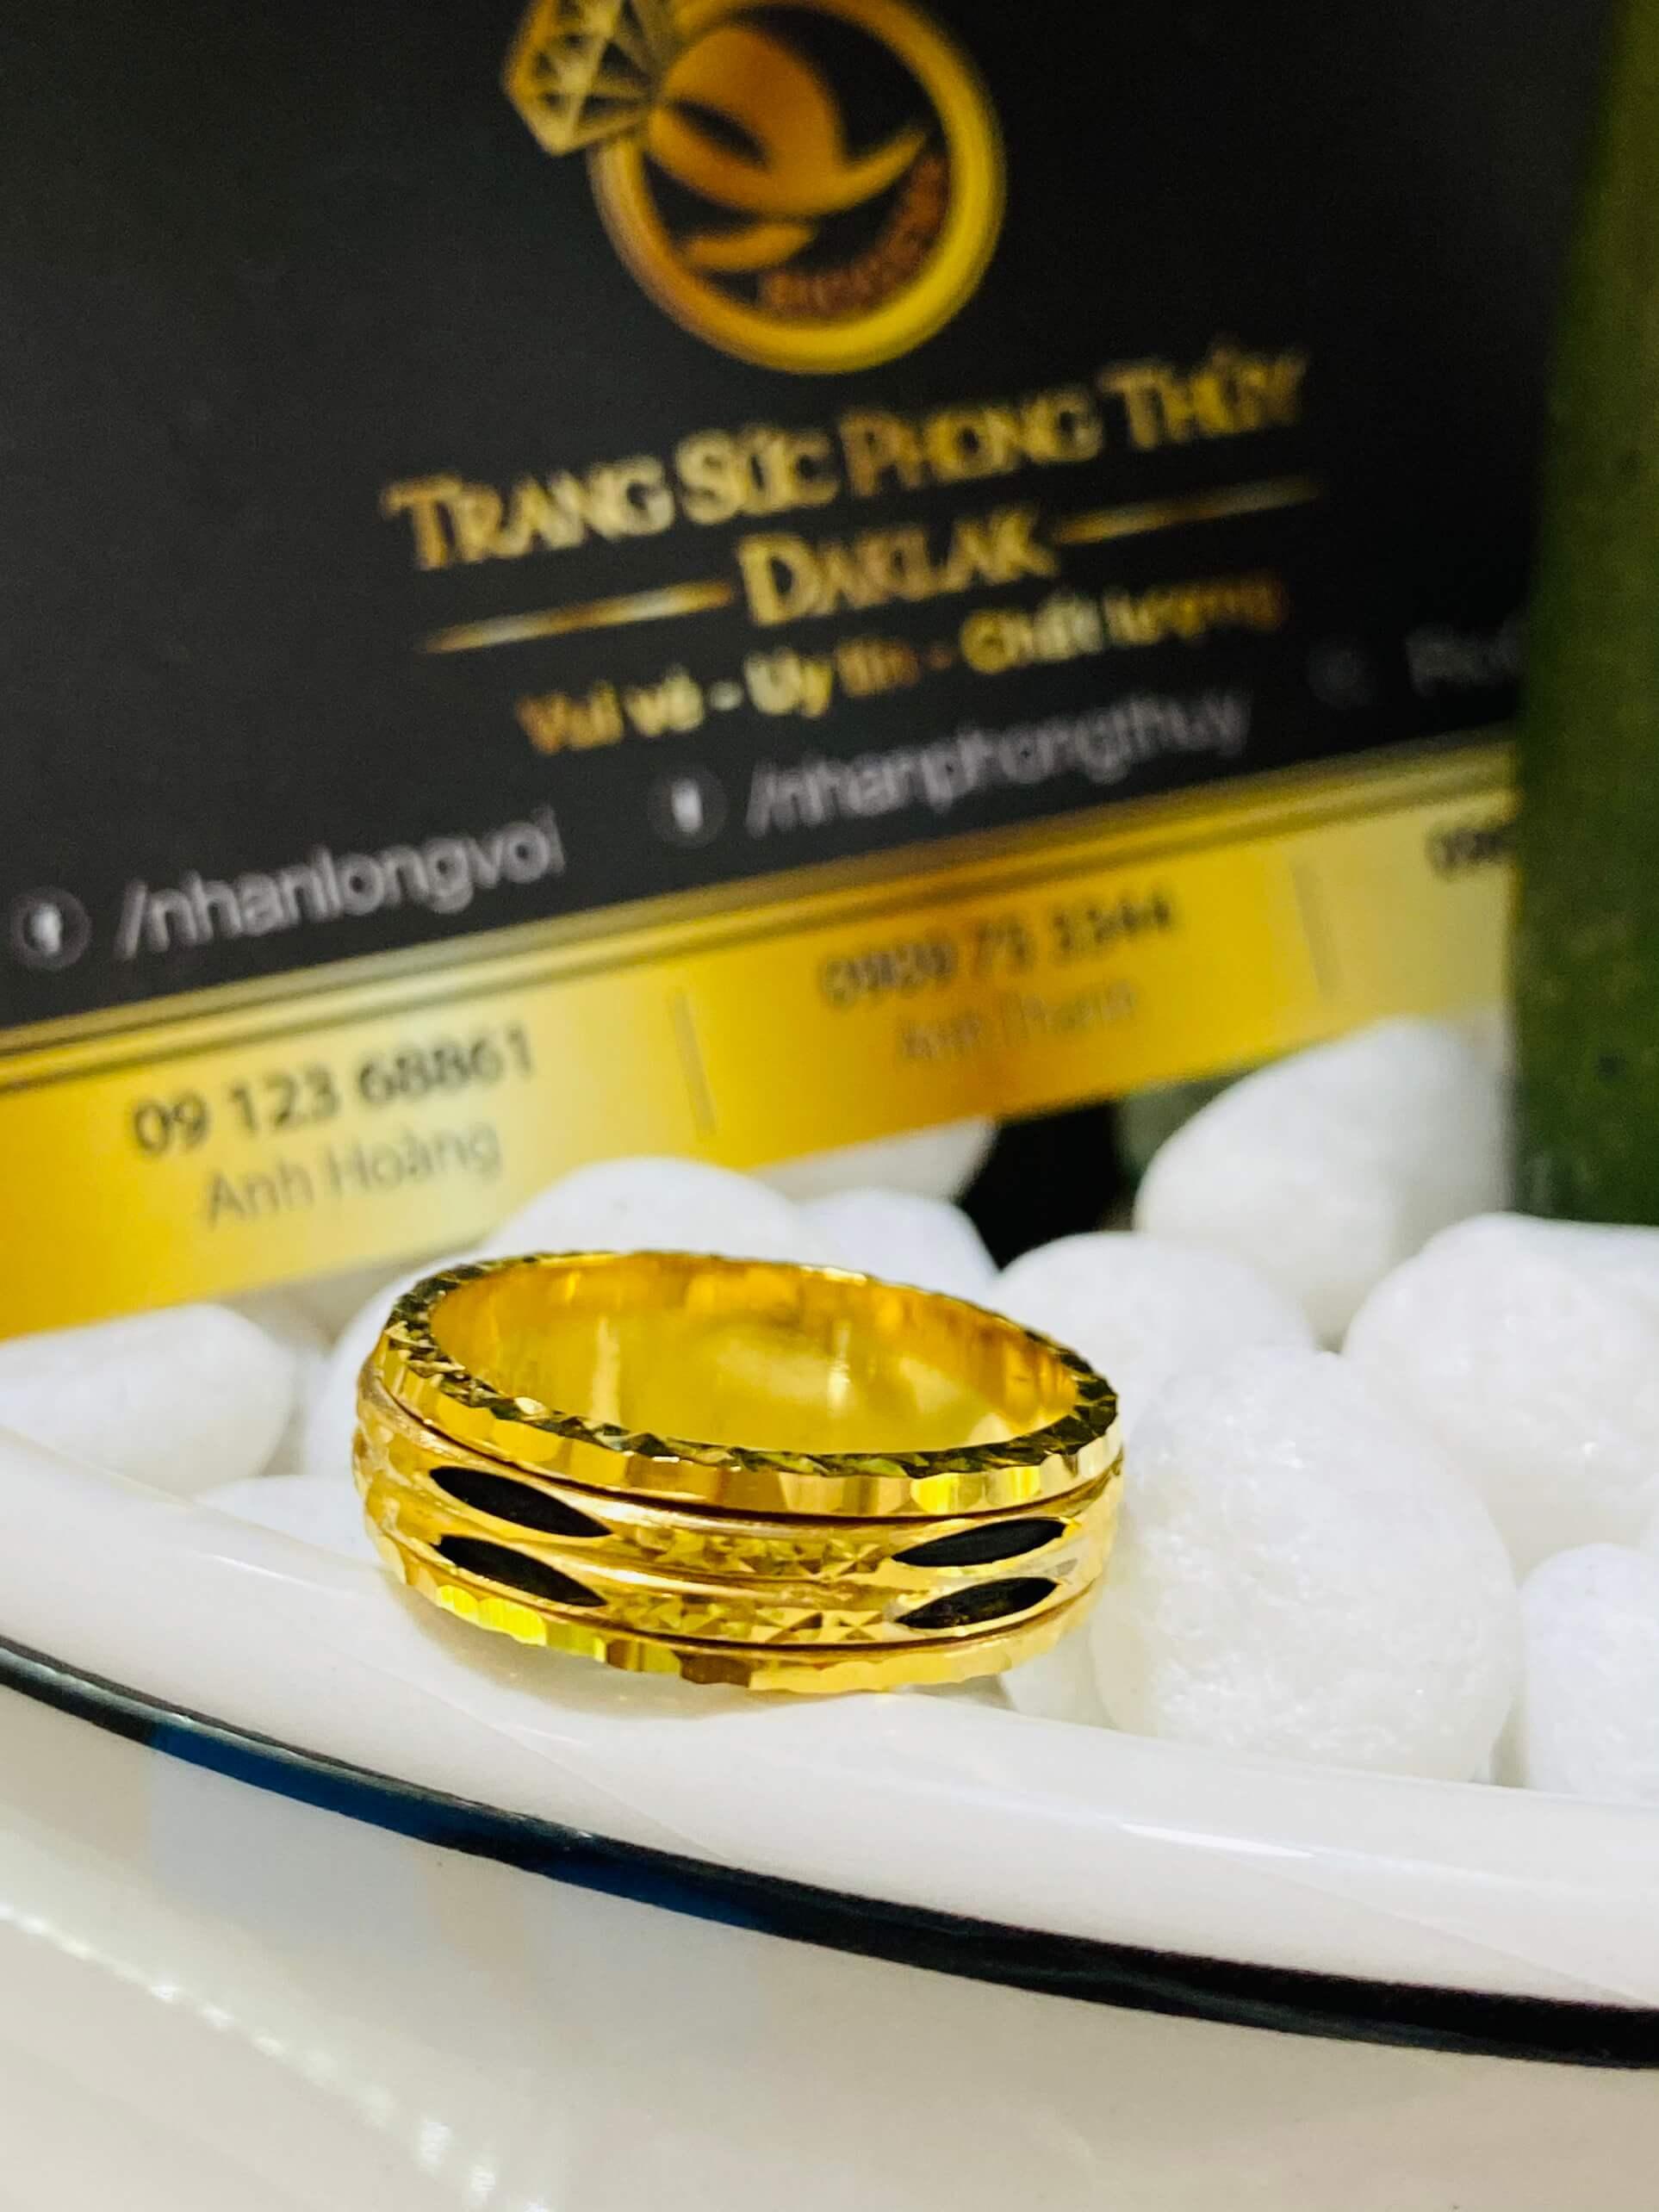 Nhan-2-Long-Voi-luong-ong-vang-song-song-xoay-360-do-cat-khia-Riogems